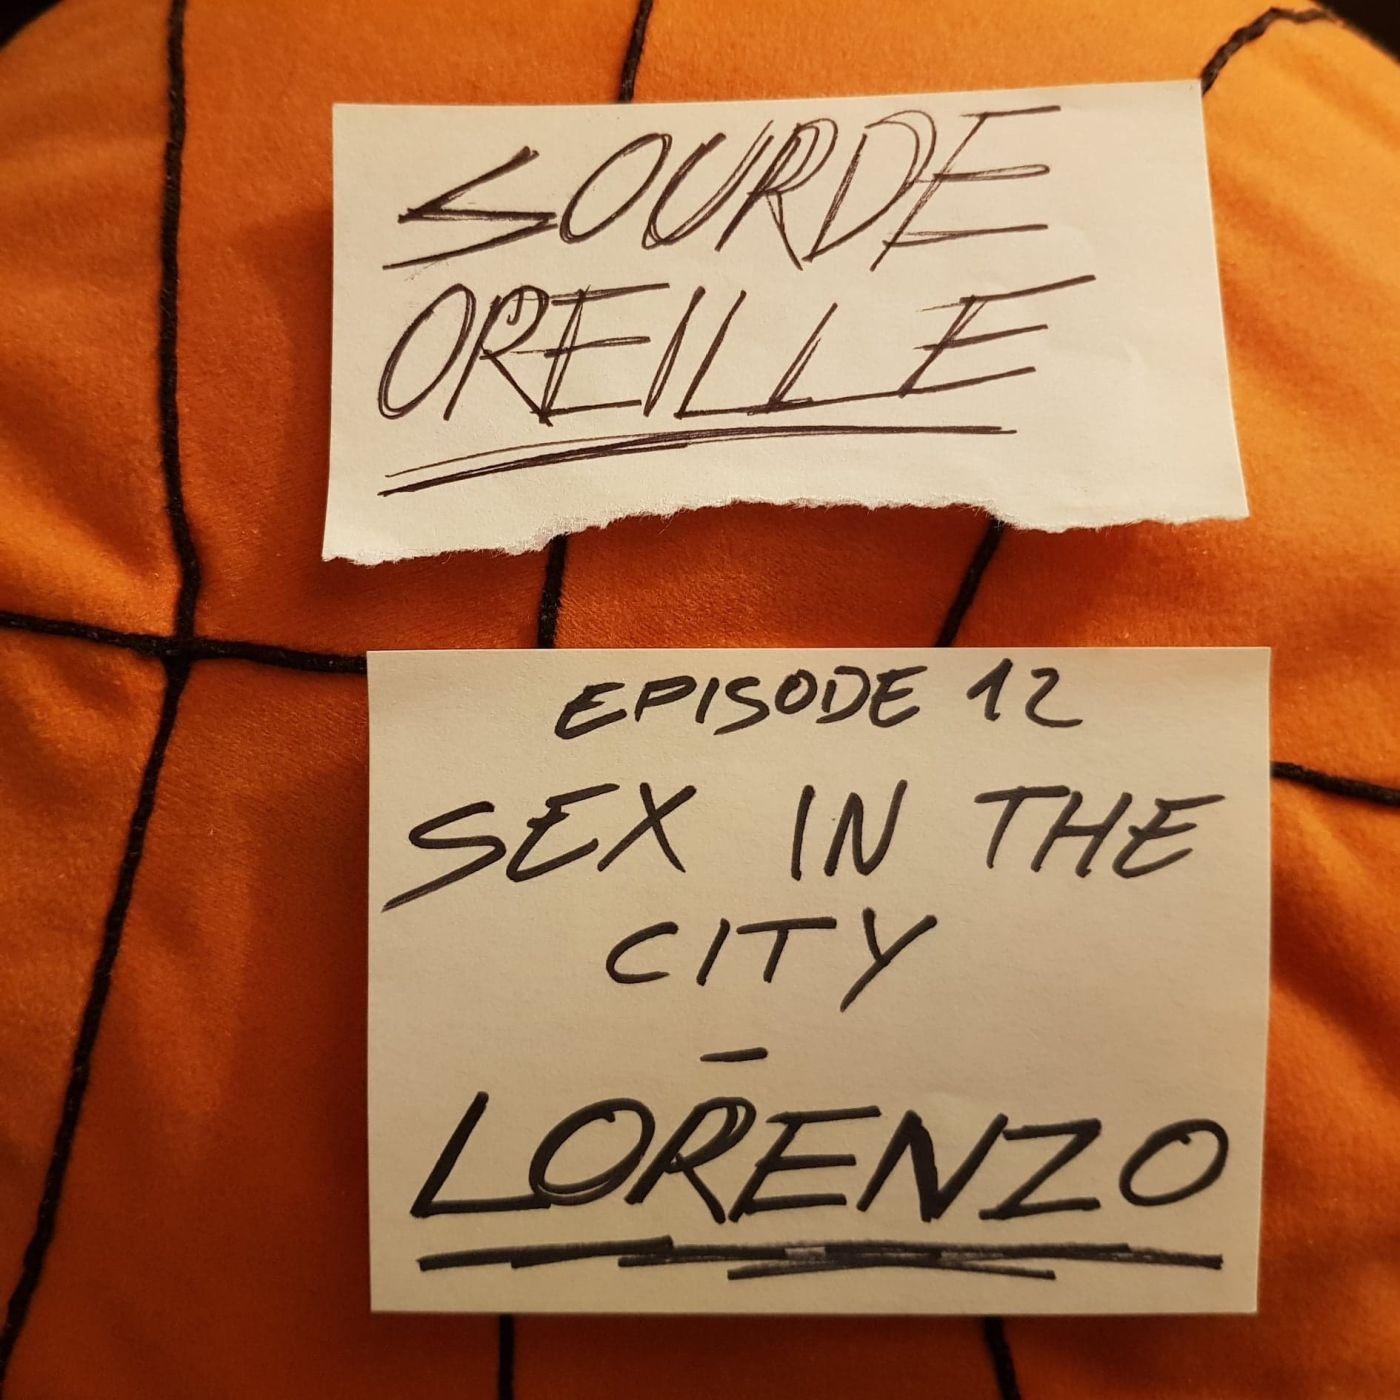 Lorenzo - Sex In The City (ce genre de nouvo album)